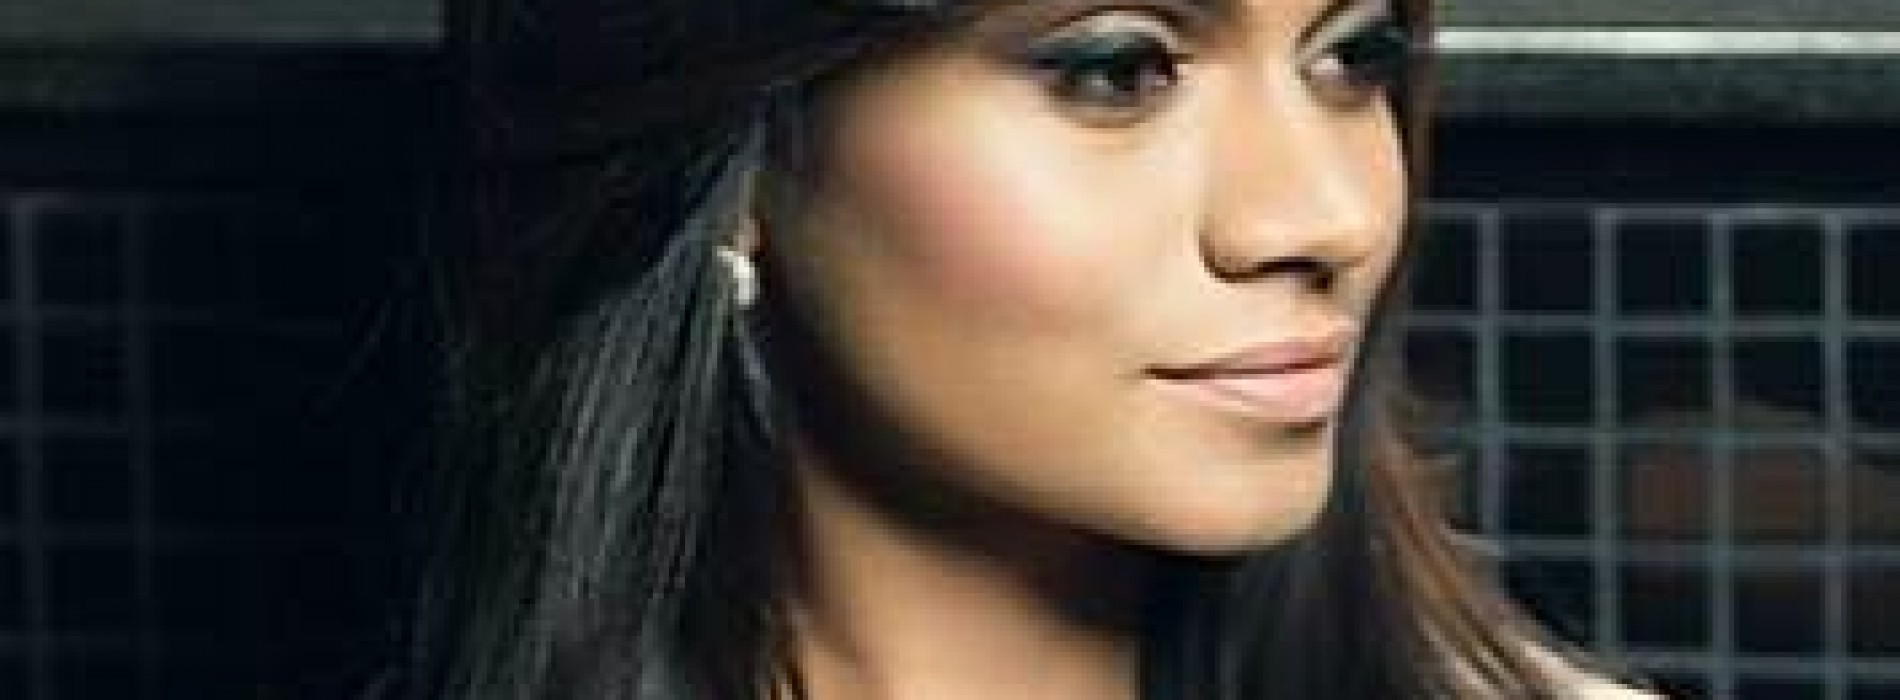 Nadine Samarasinghe: Free